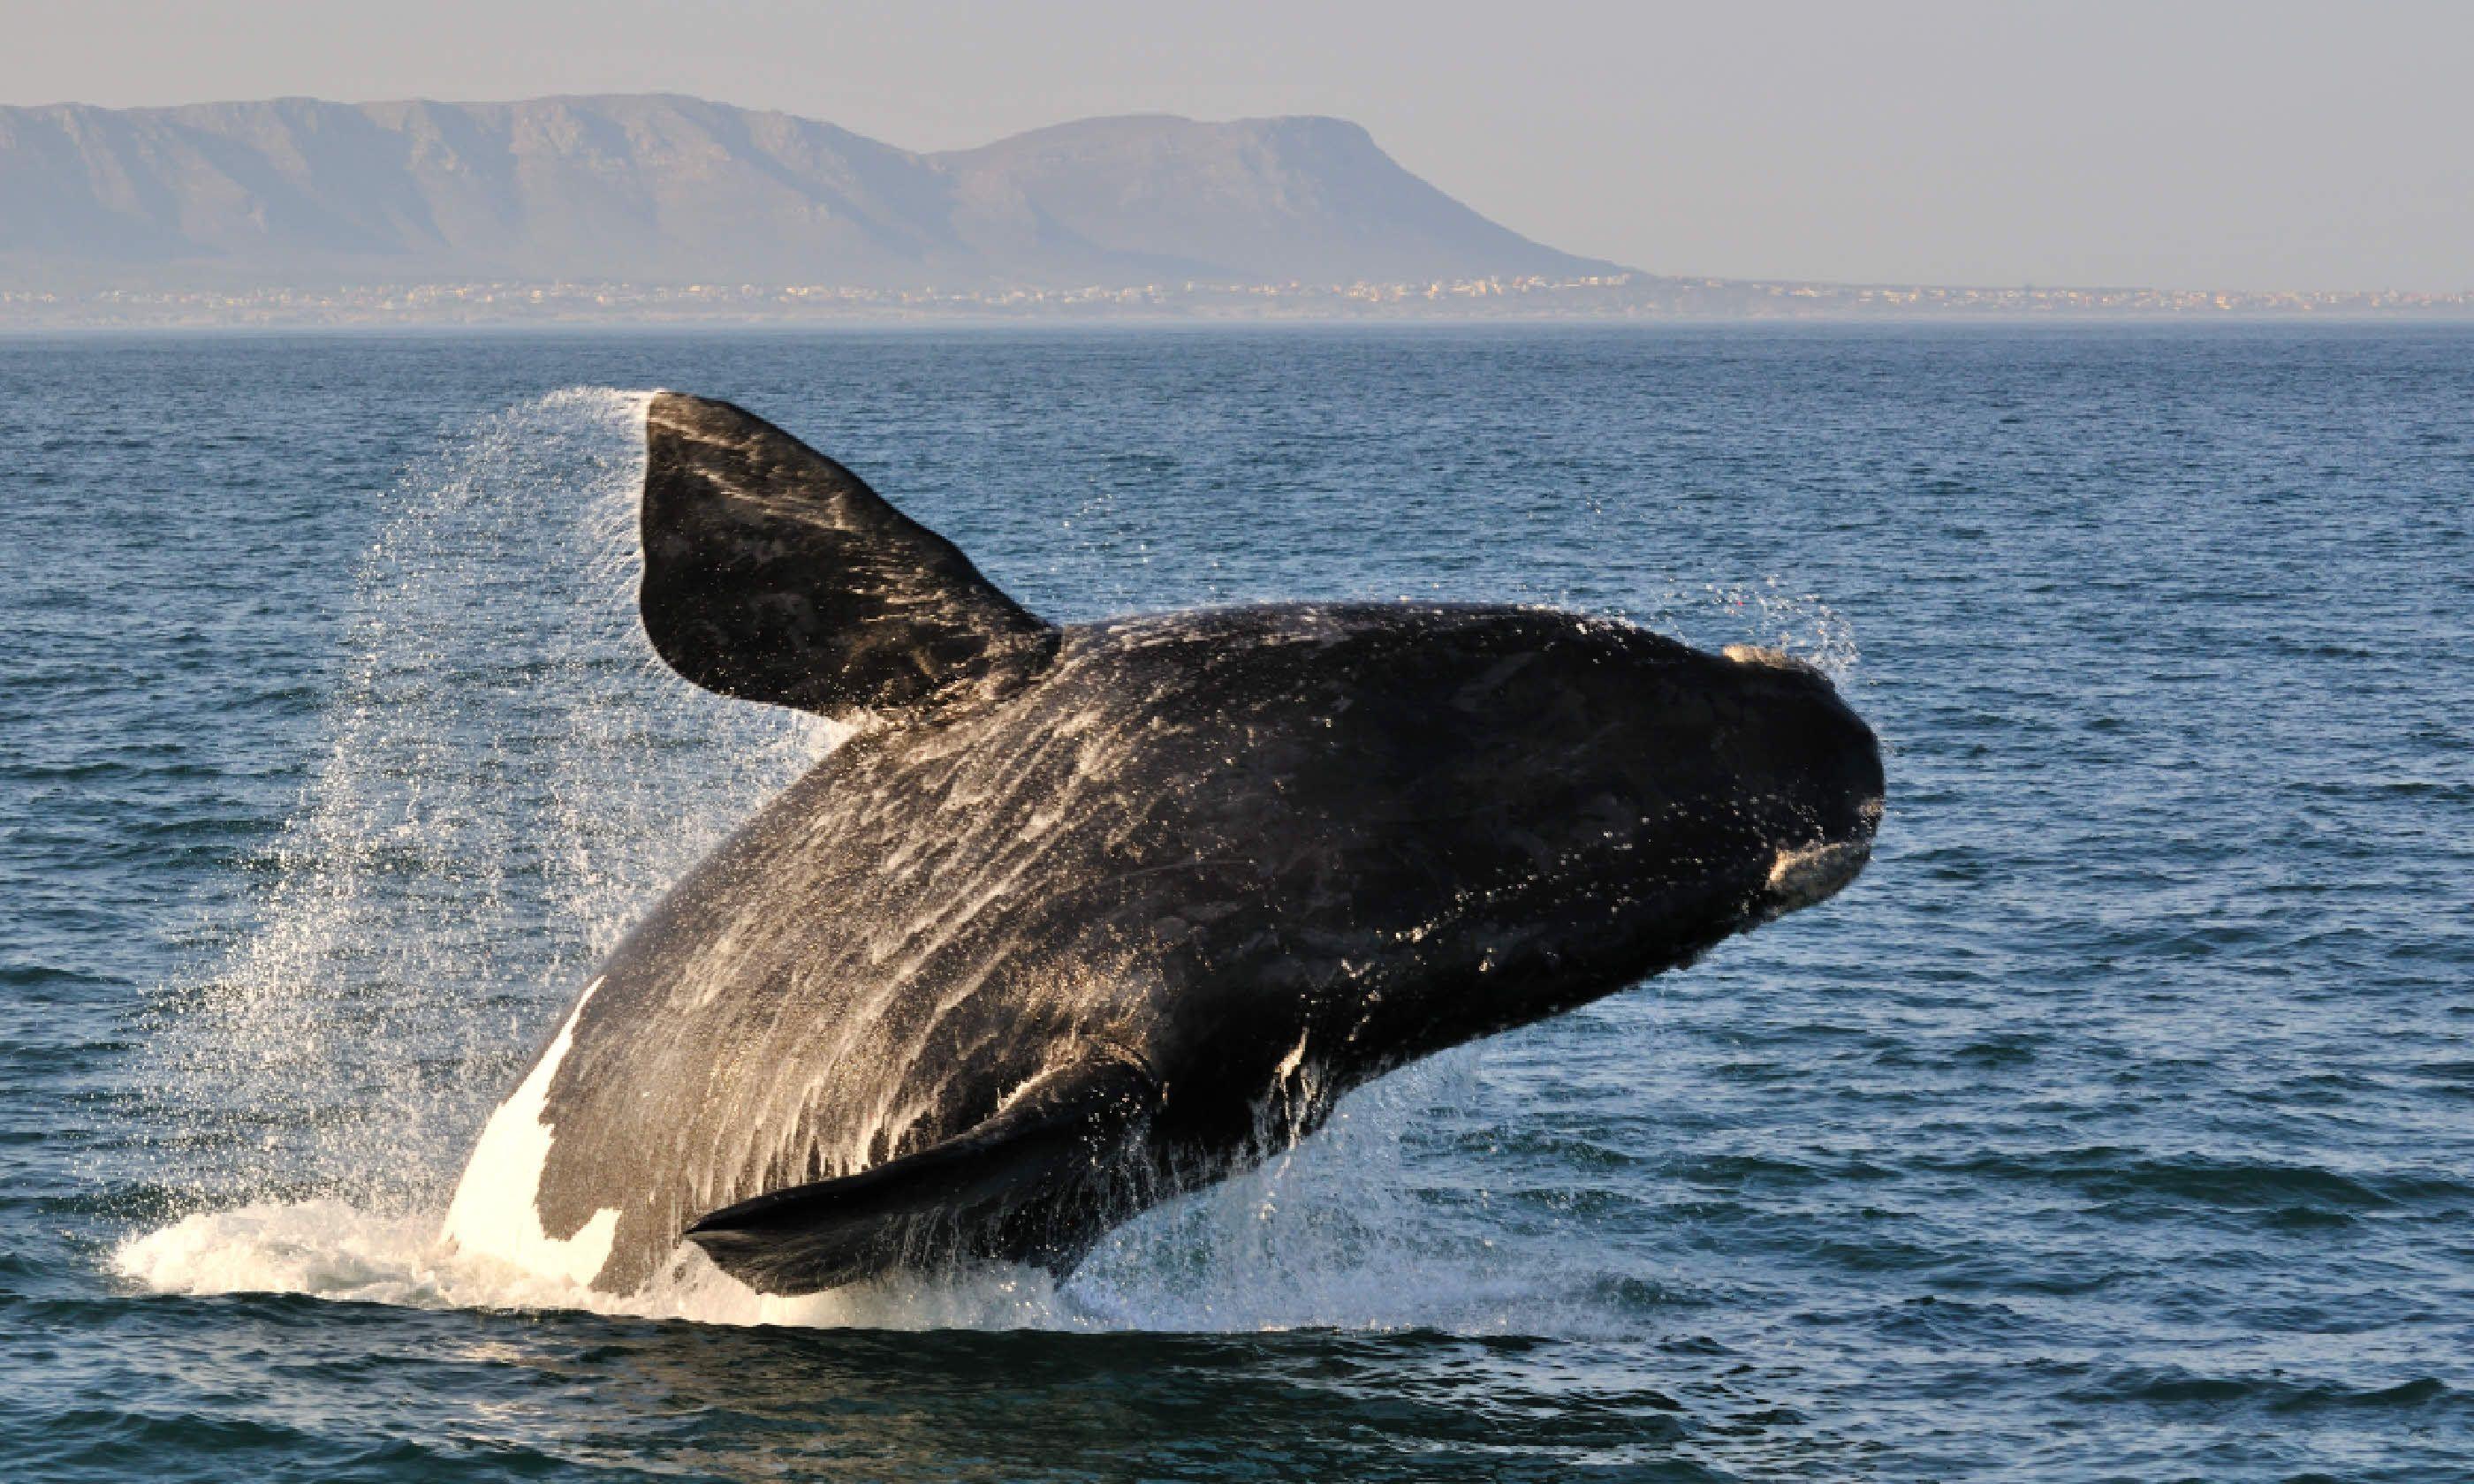 Whale breach in Hermanus, South Africa (Shutterstock)